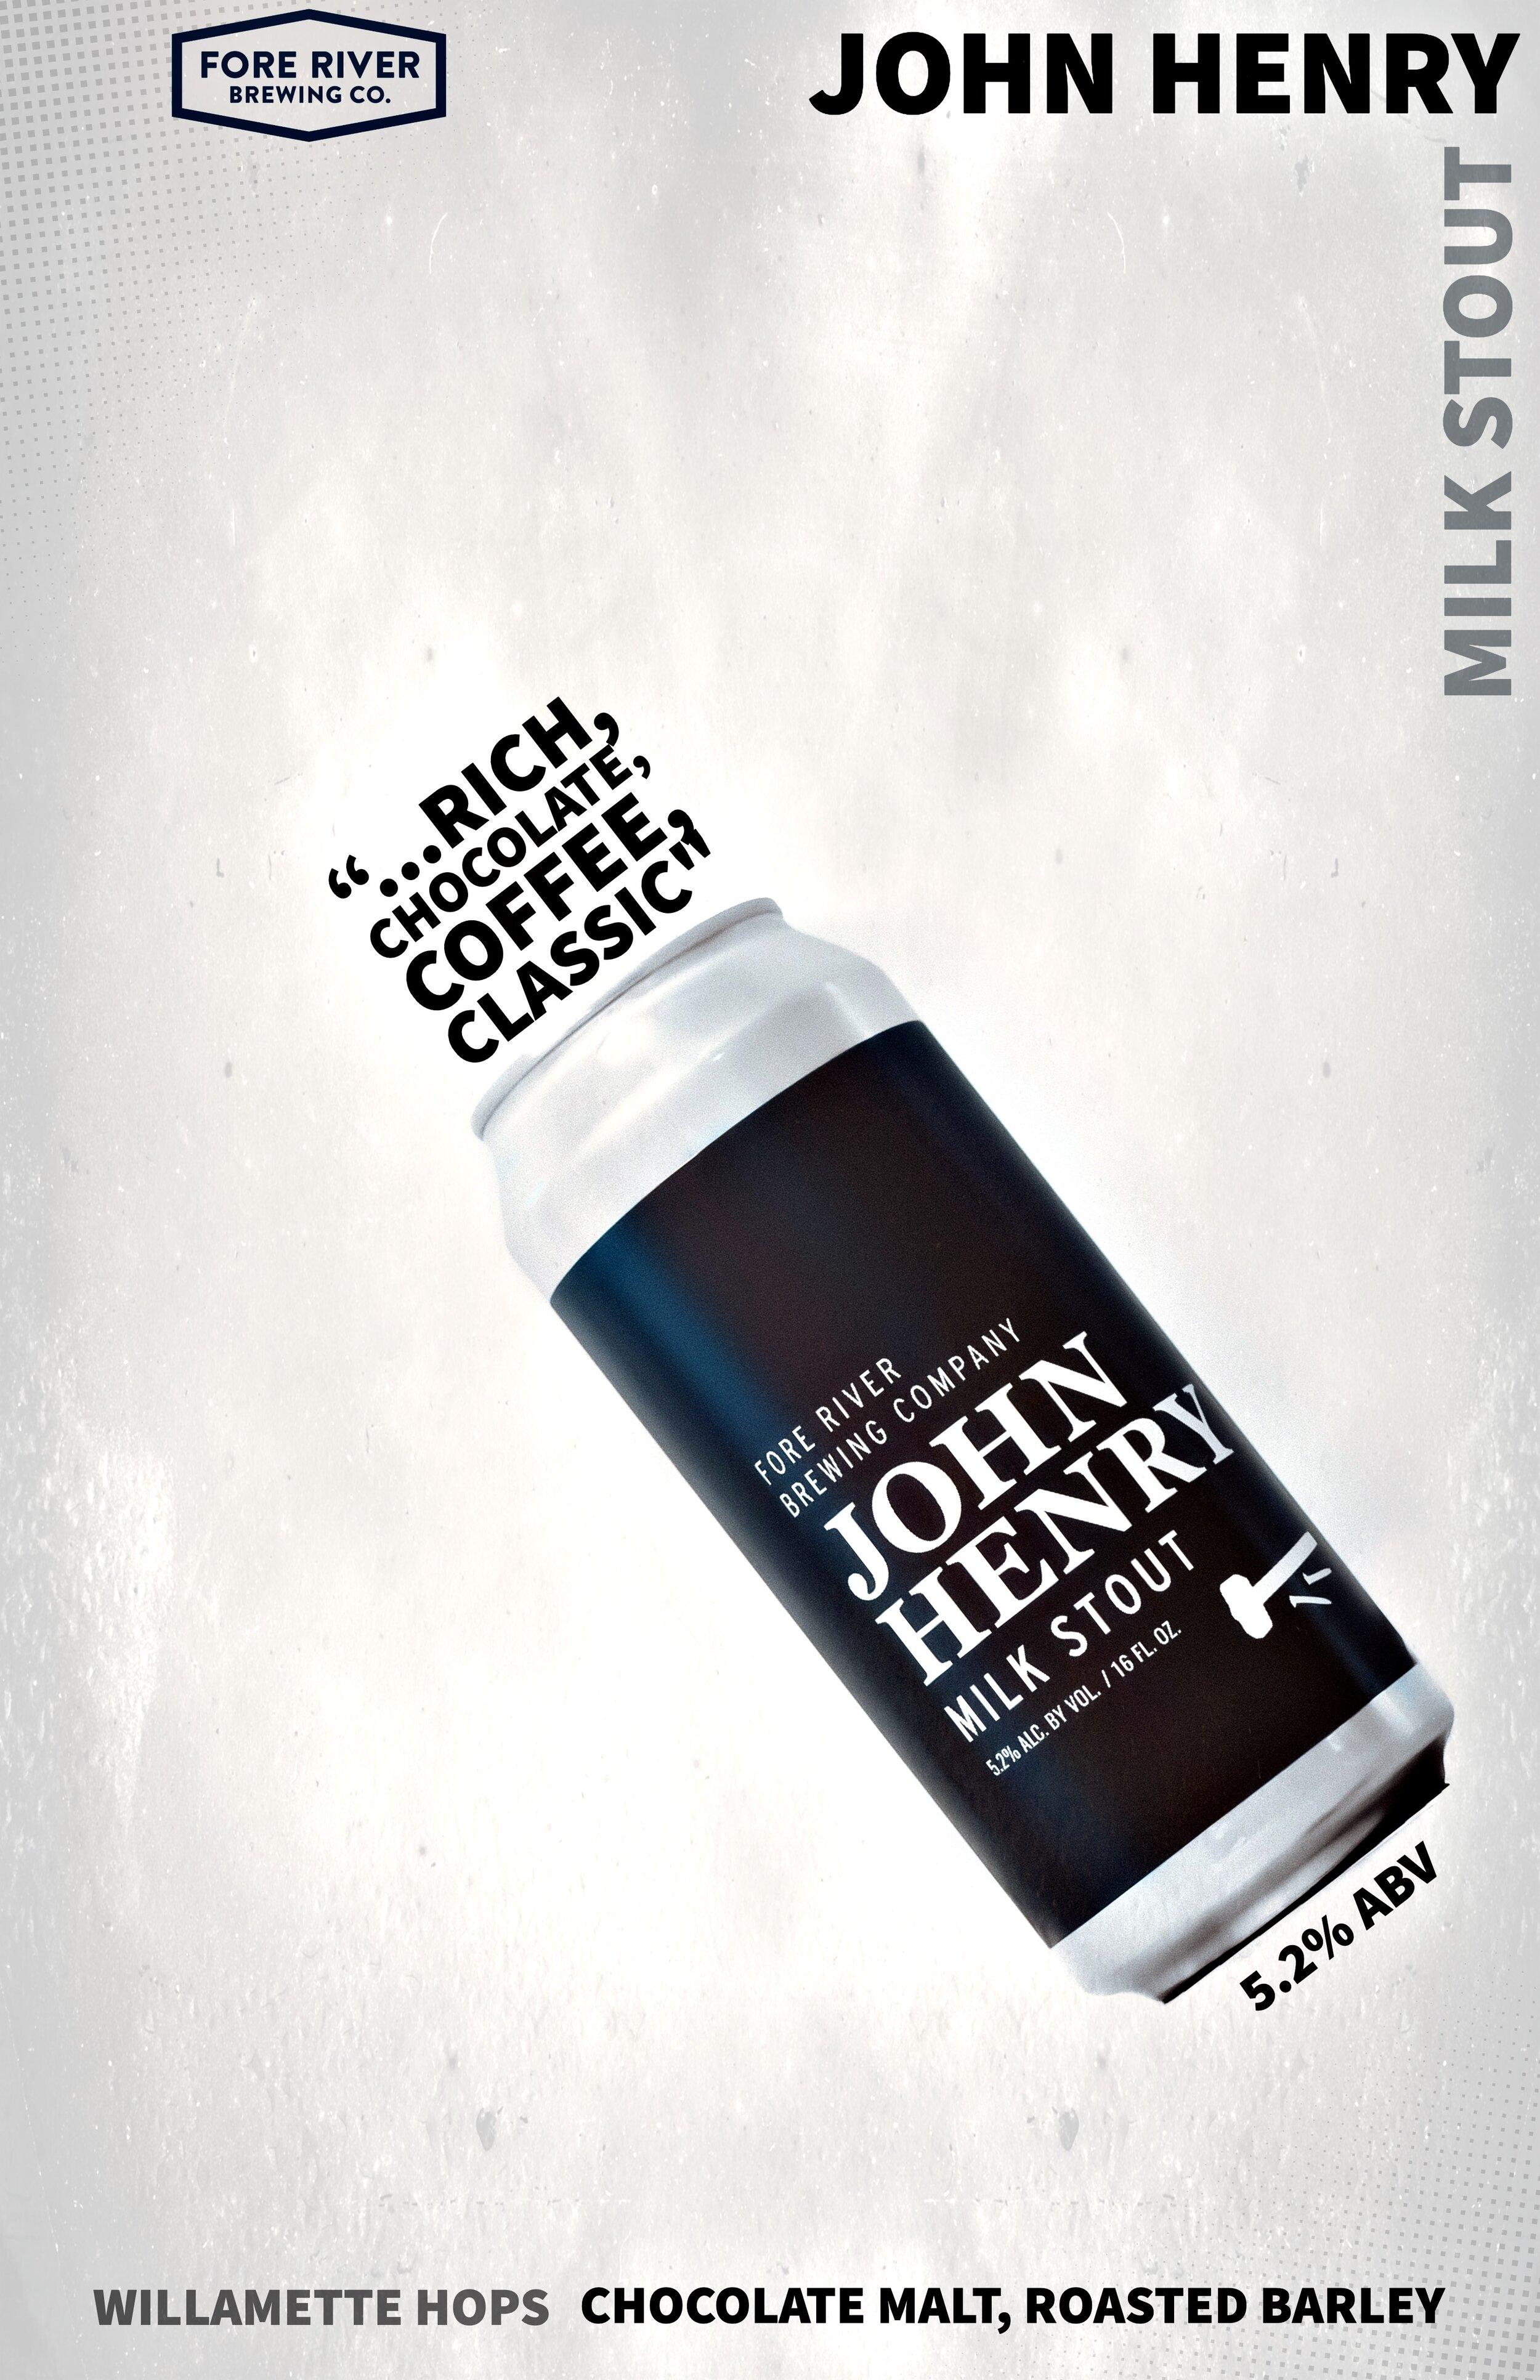 john henry - milk stout